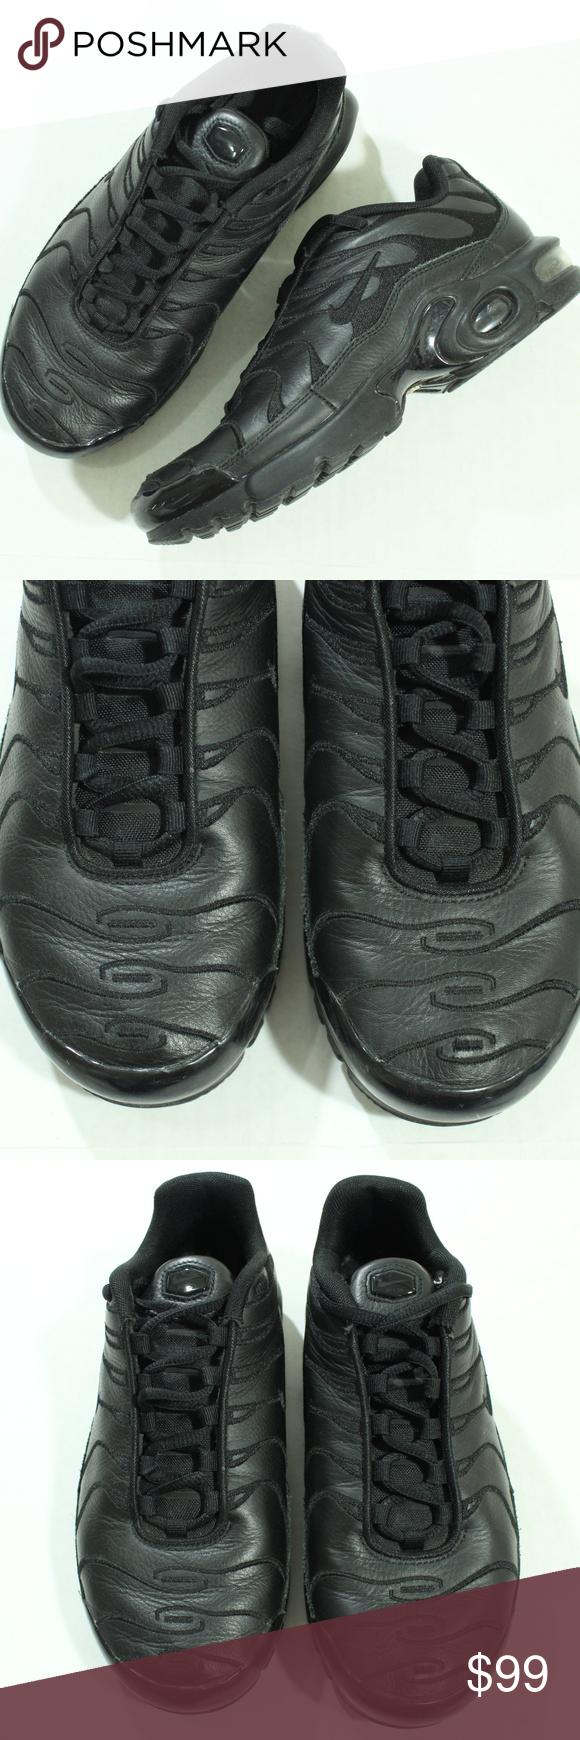 nike air max plus leather